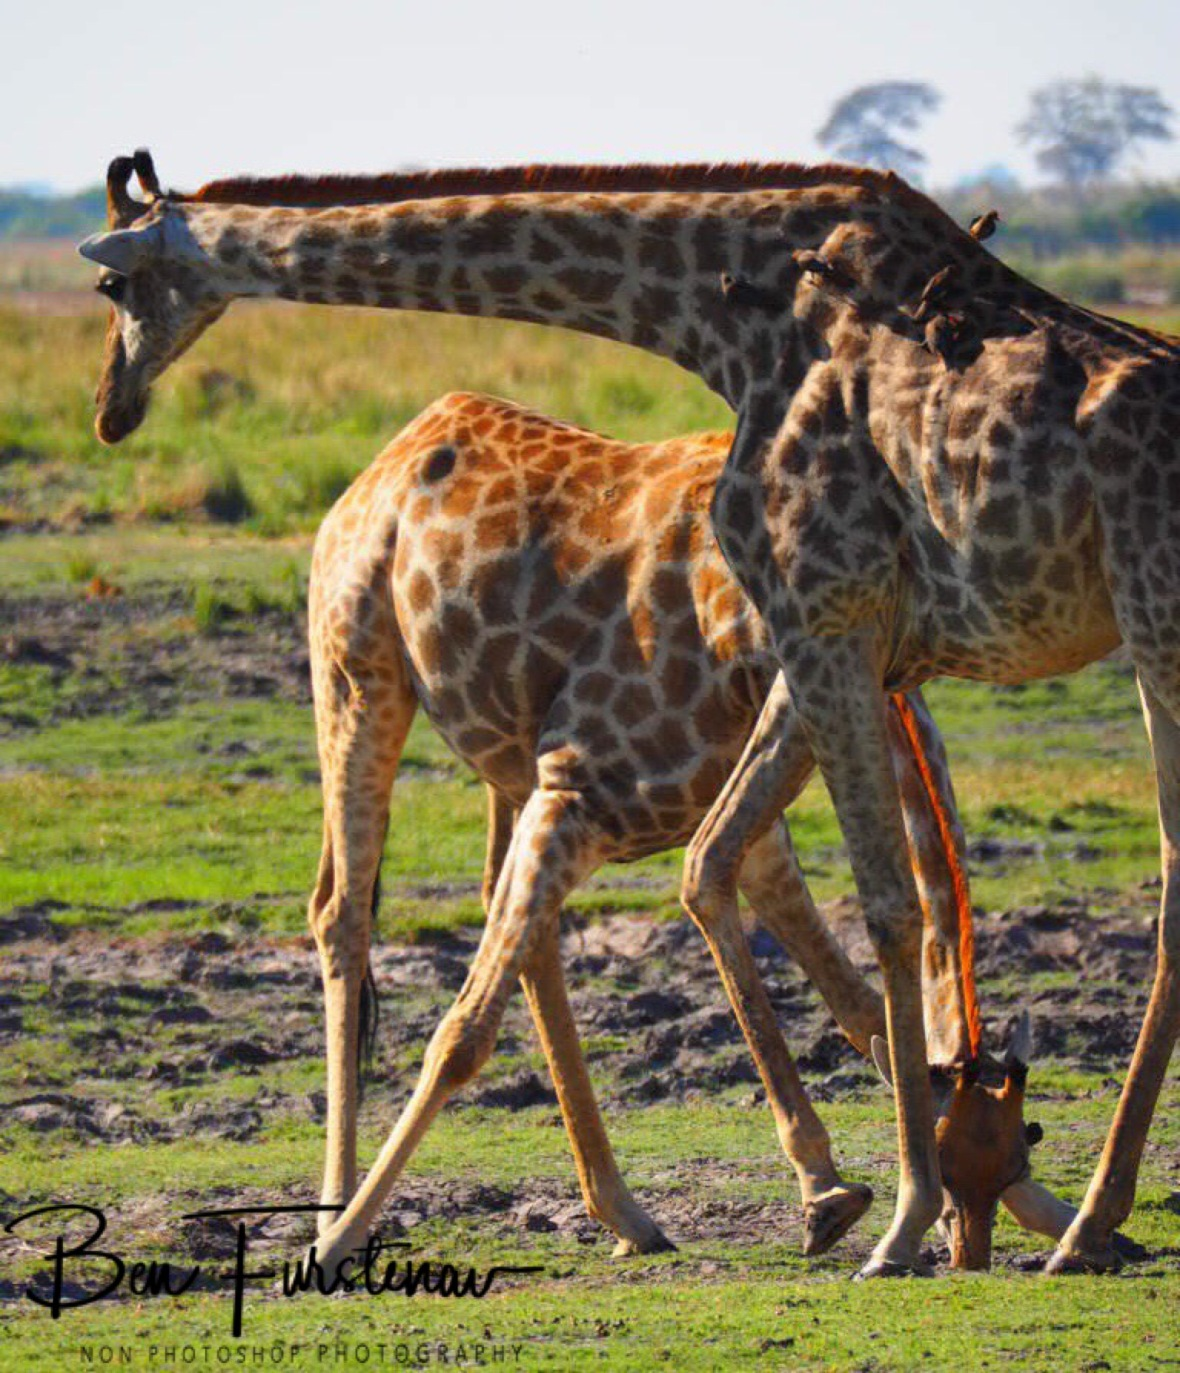 Overlooking the situation, Chobe National Park, Botswana